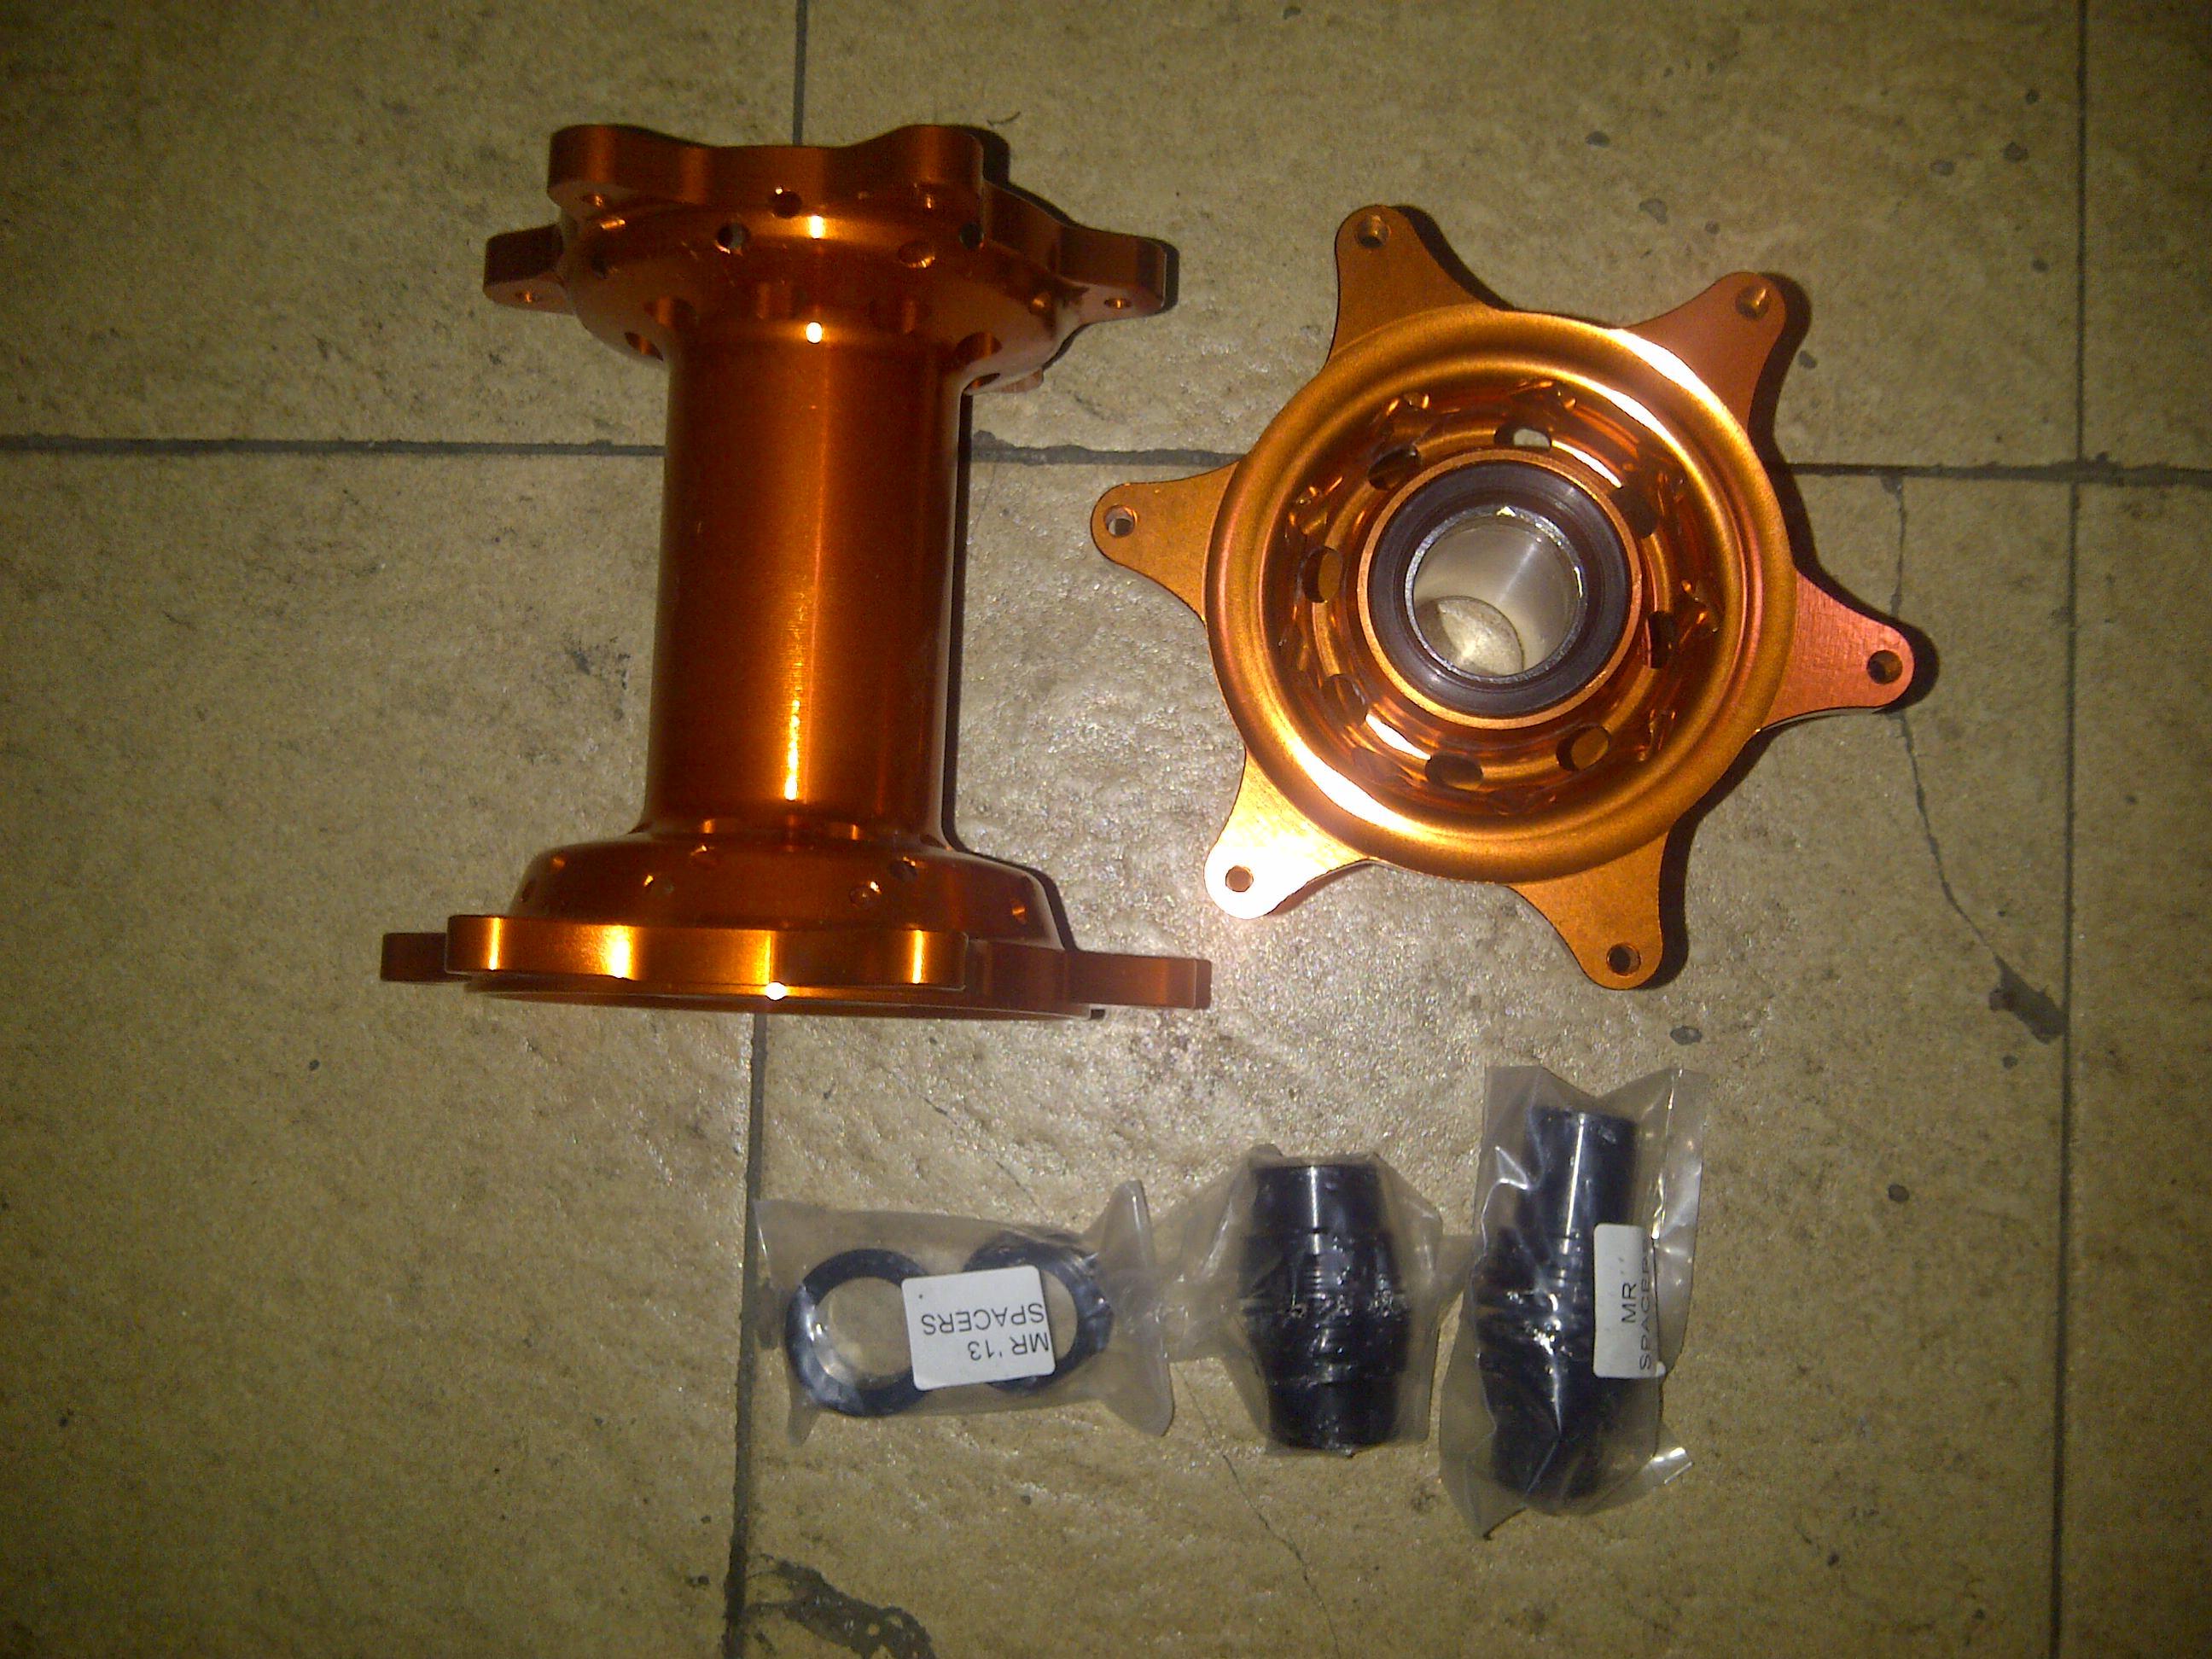 IMG 20140904 00166 teromol KTM cnc merk snd hrg 4,5 jt